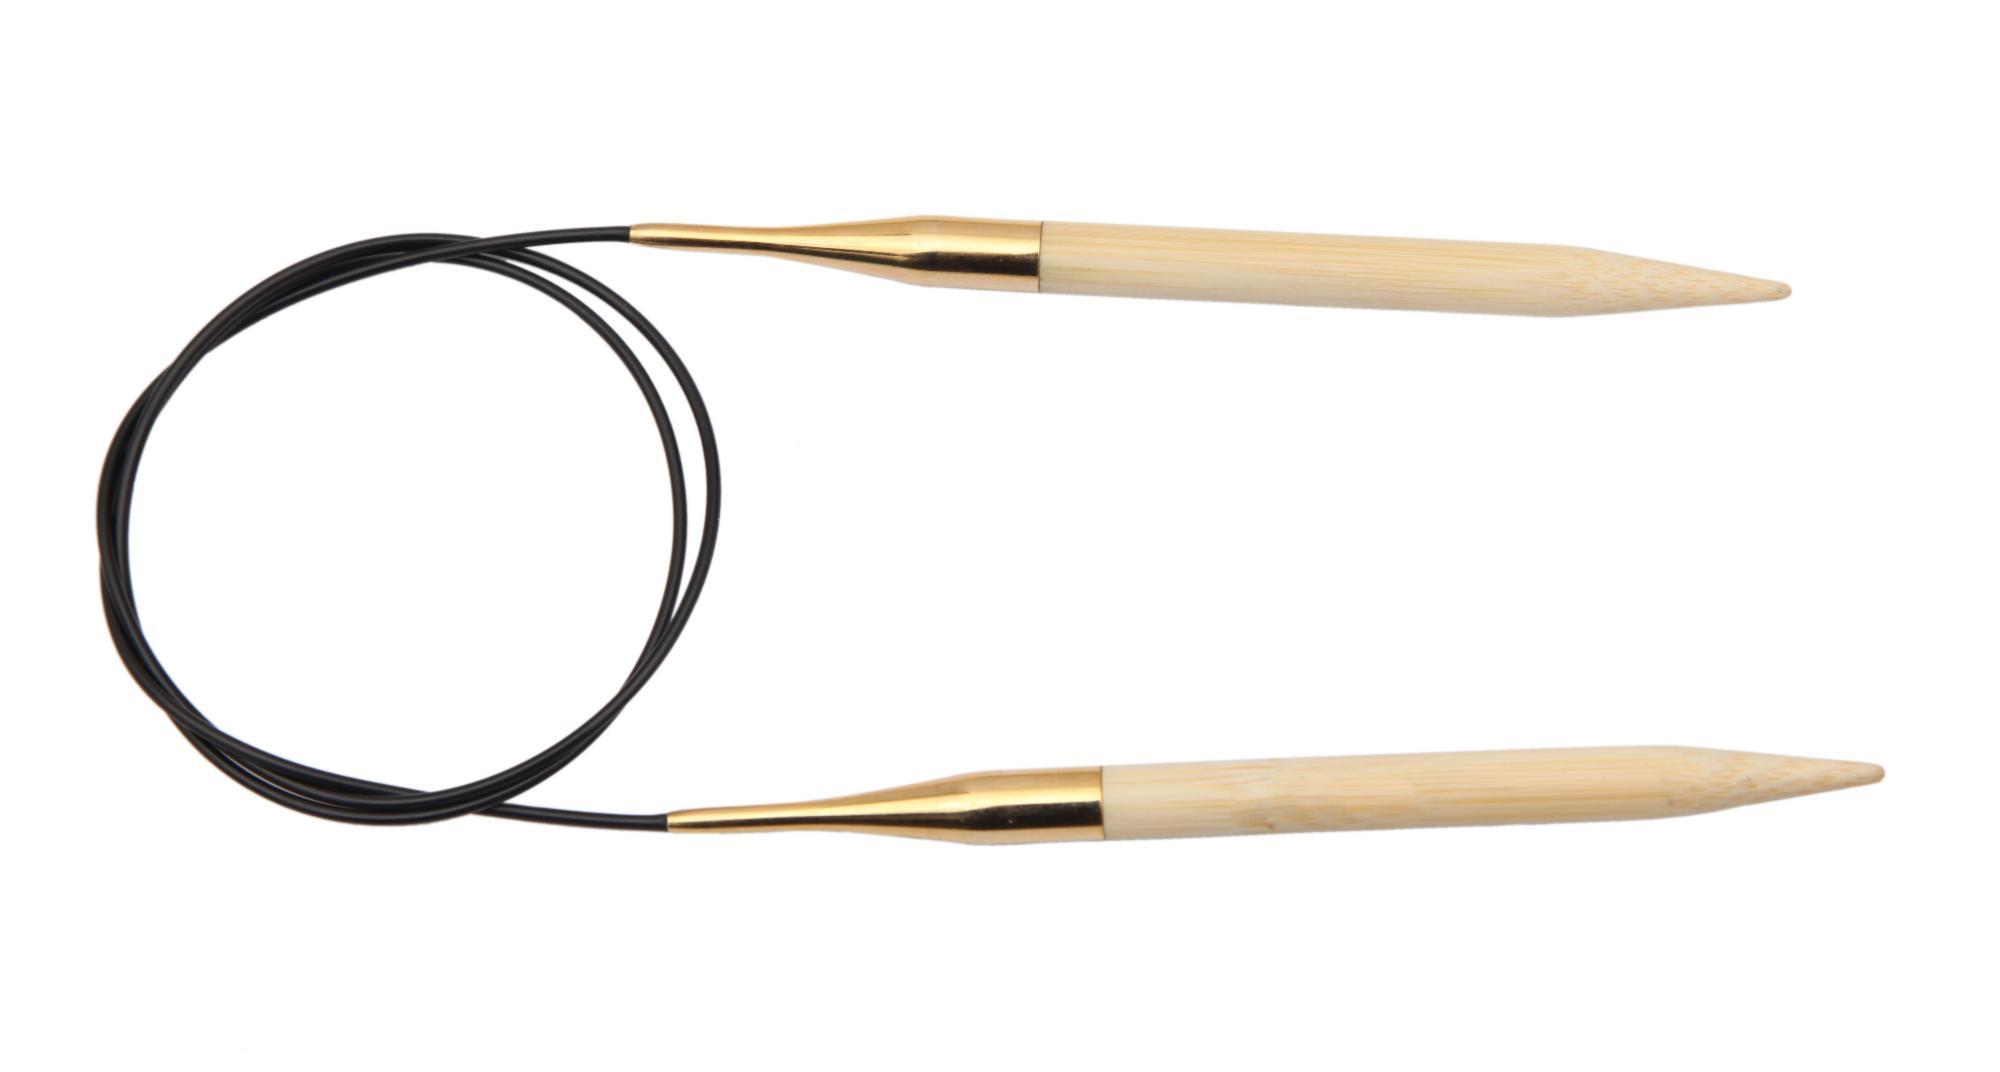 Спицы круговые 60 см Bamboo KnitPro, 22225, 3.00 мм